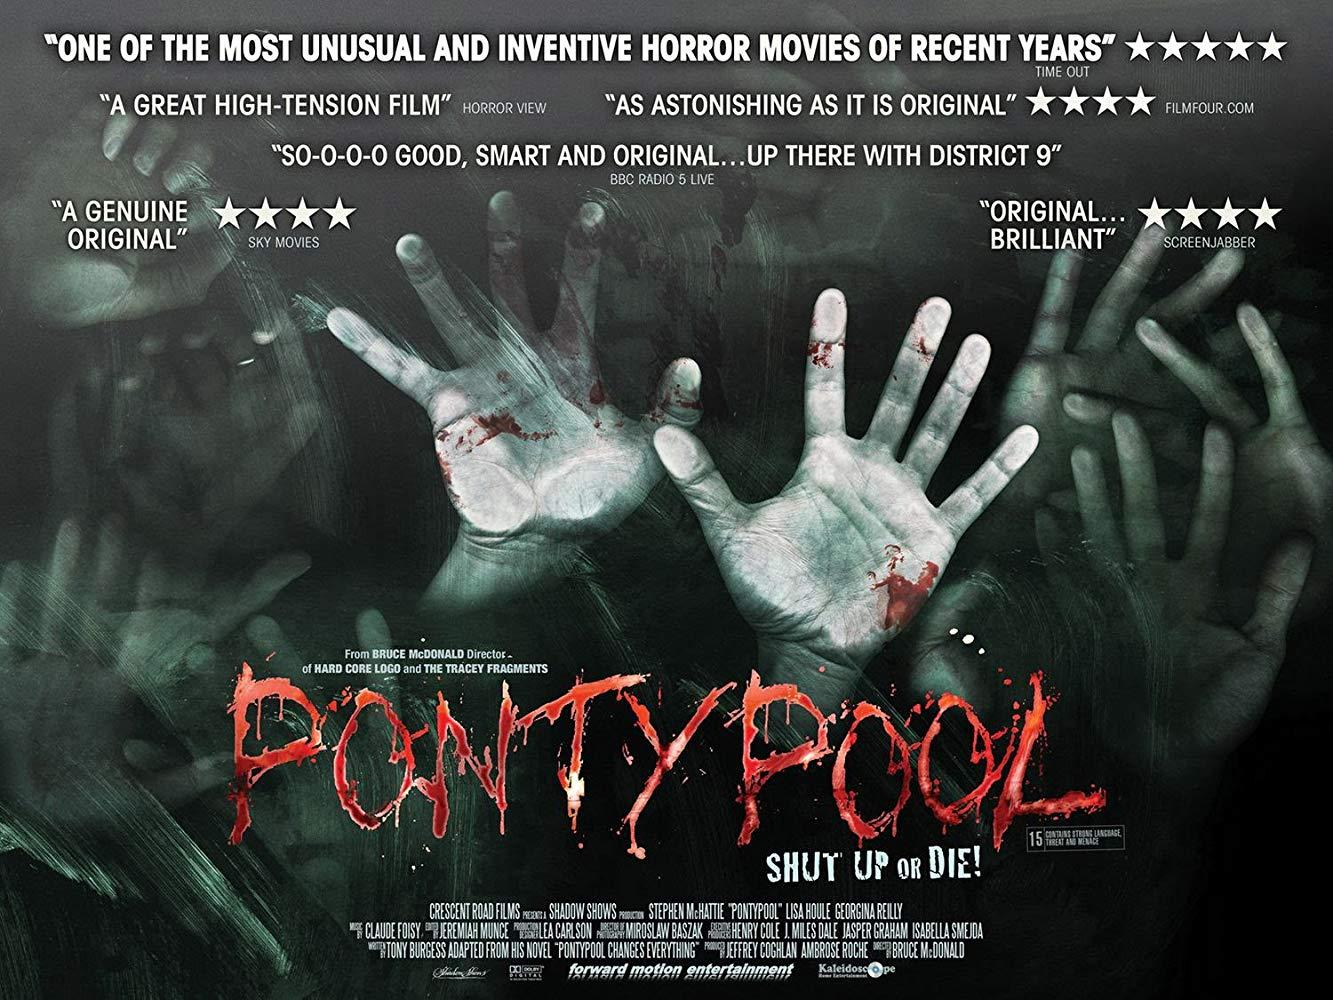 مشاهدة فيلم Pontypool 2008 HD مترجم كامل اون لاين